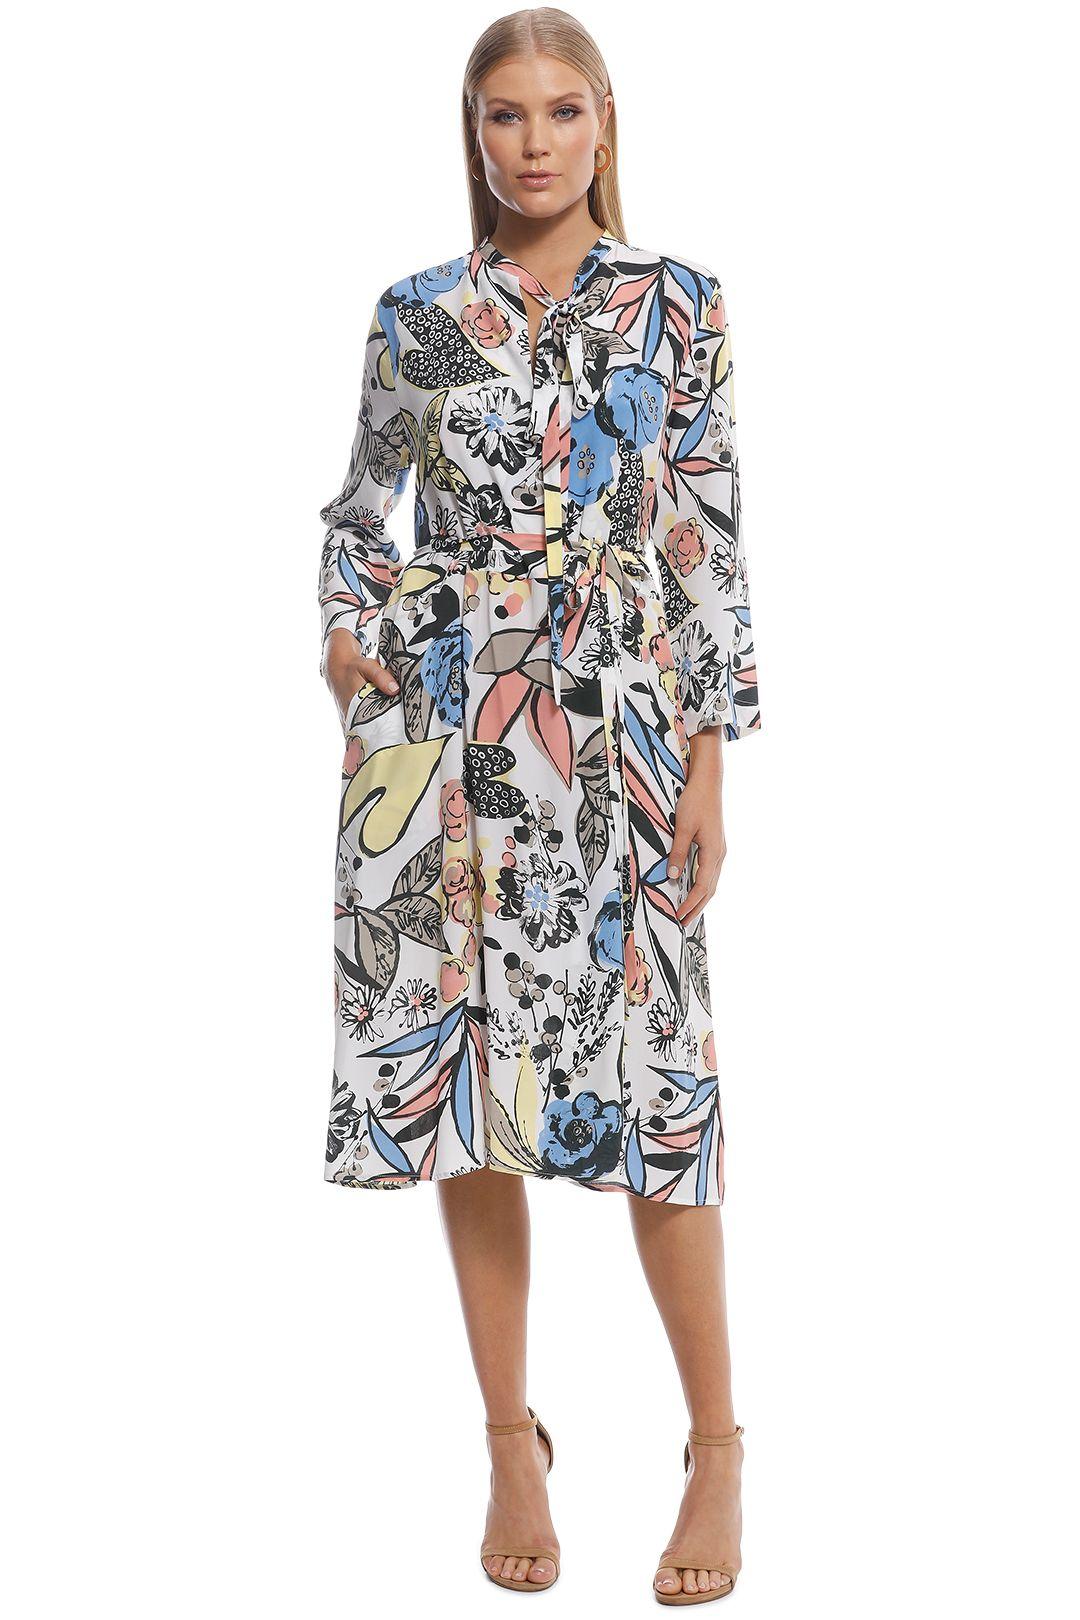 Scanlan Theordore - CDC leaf print dress - print - front